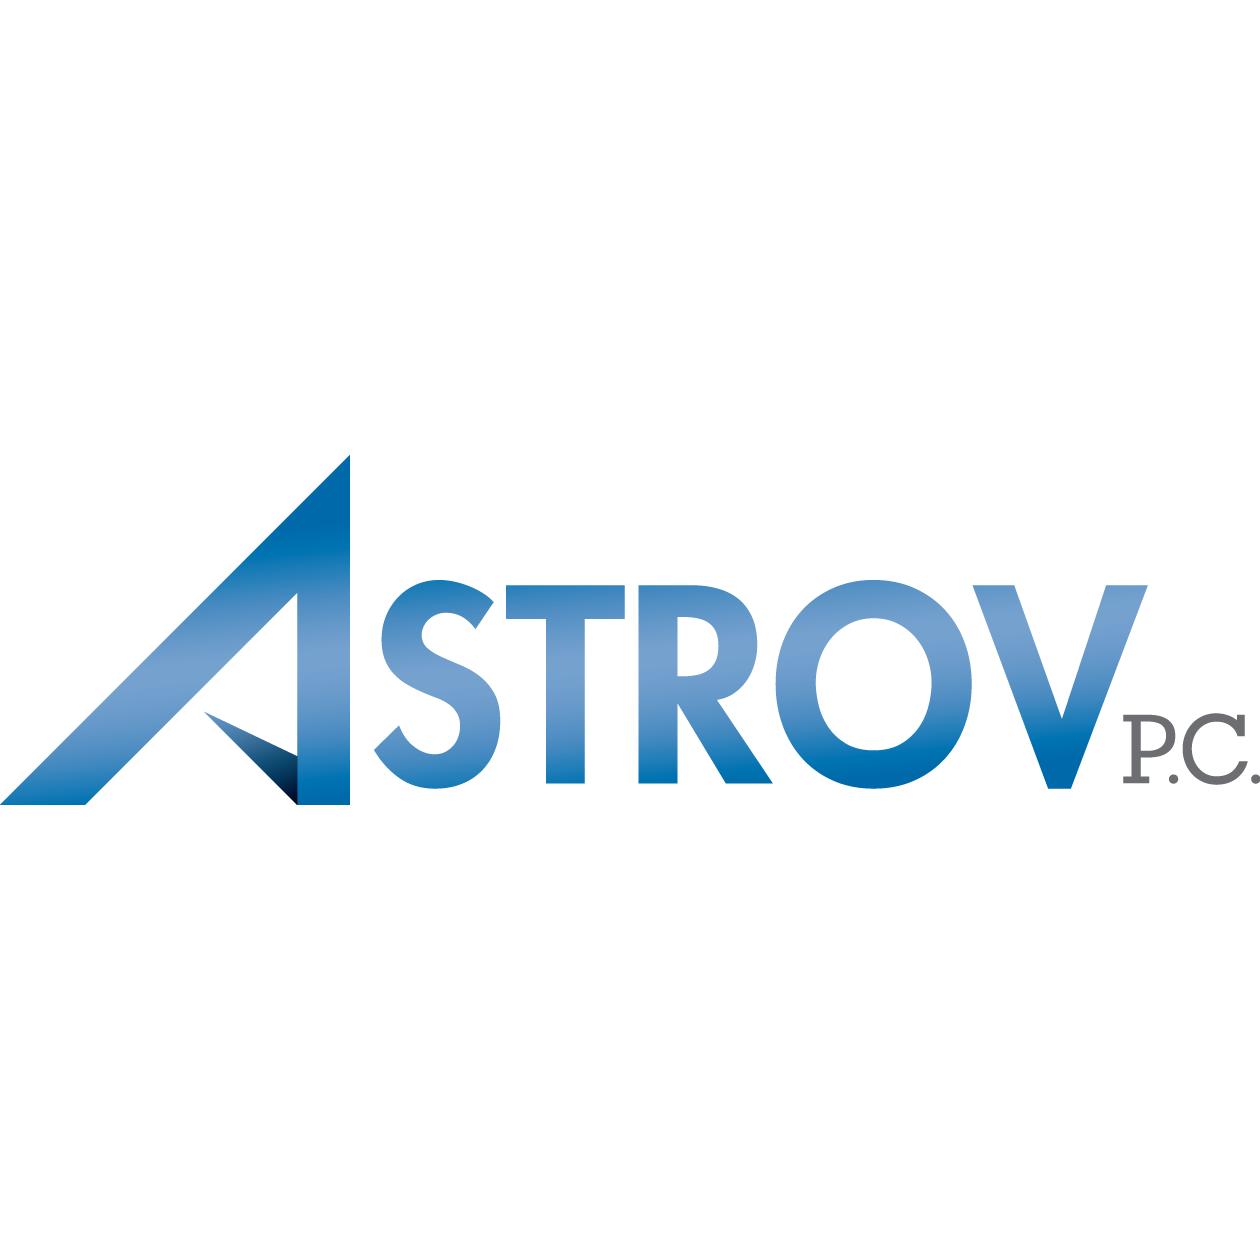 Astrov PC